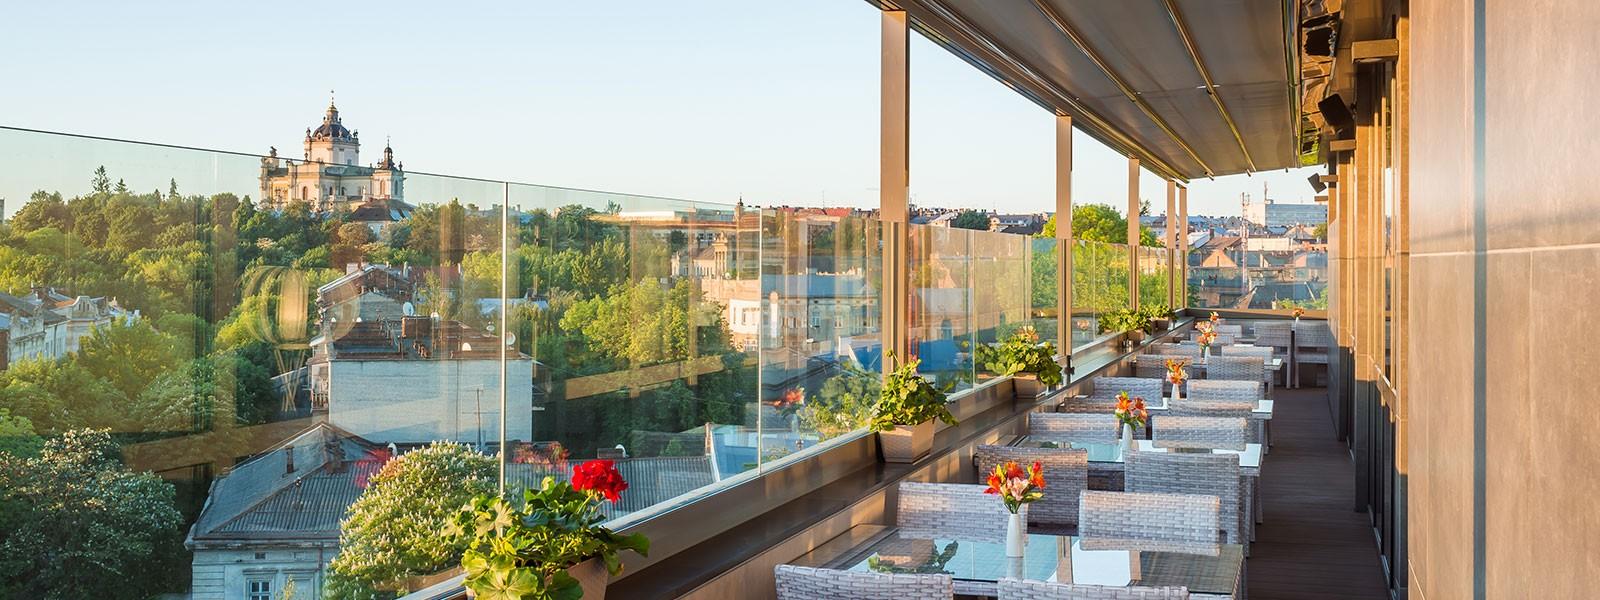 Soprano.Roof terrace - фото 6